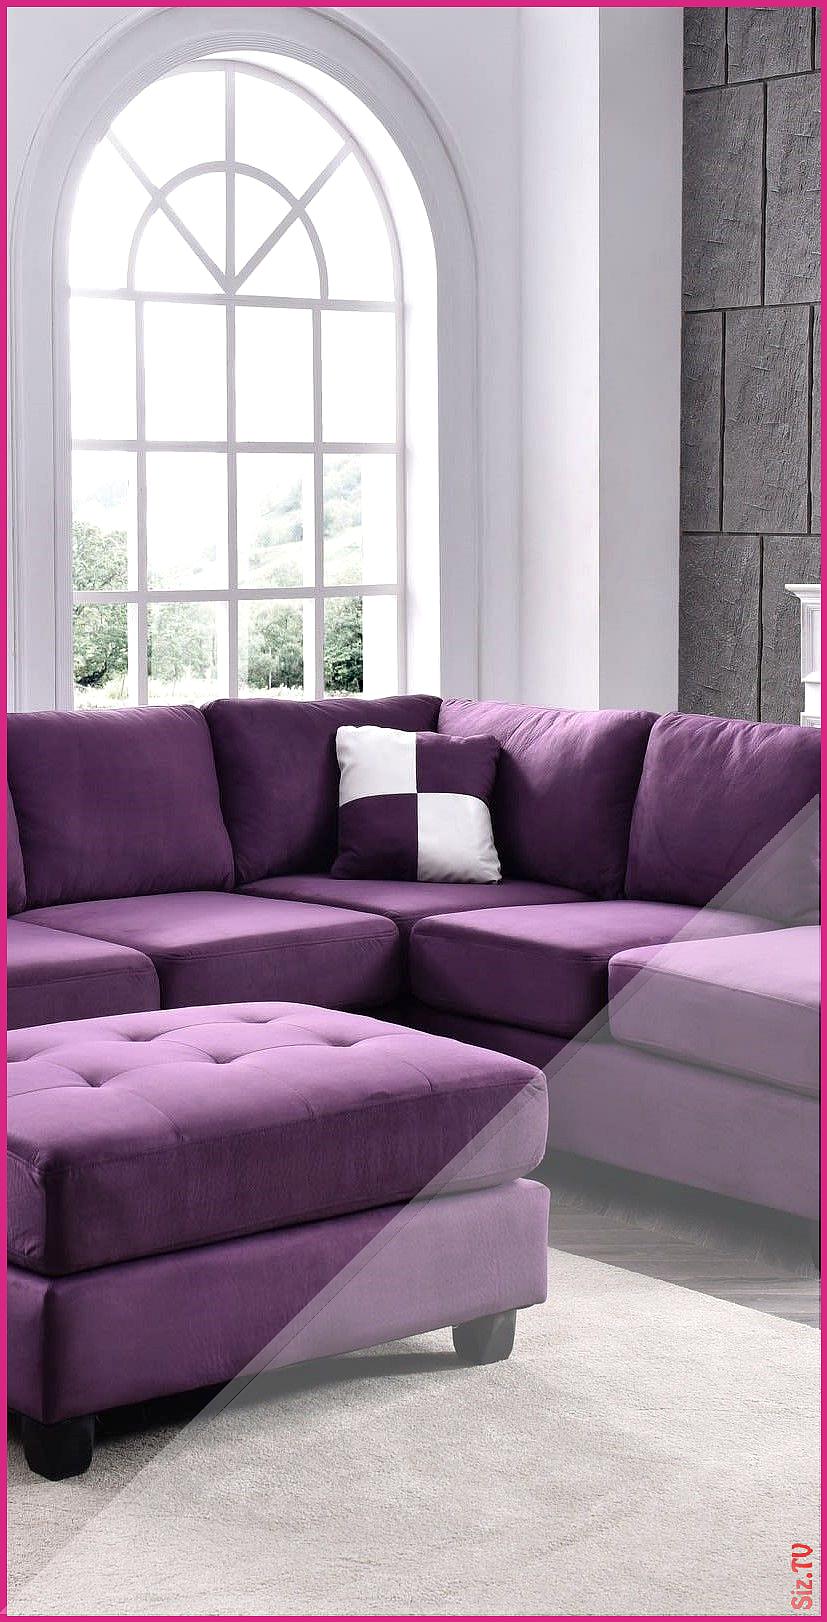 20 Purple Room Decorating Ideas How To Use Purple Walls 20 Pu